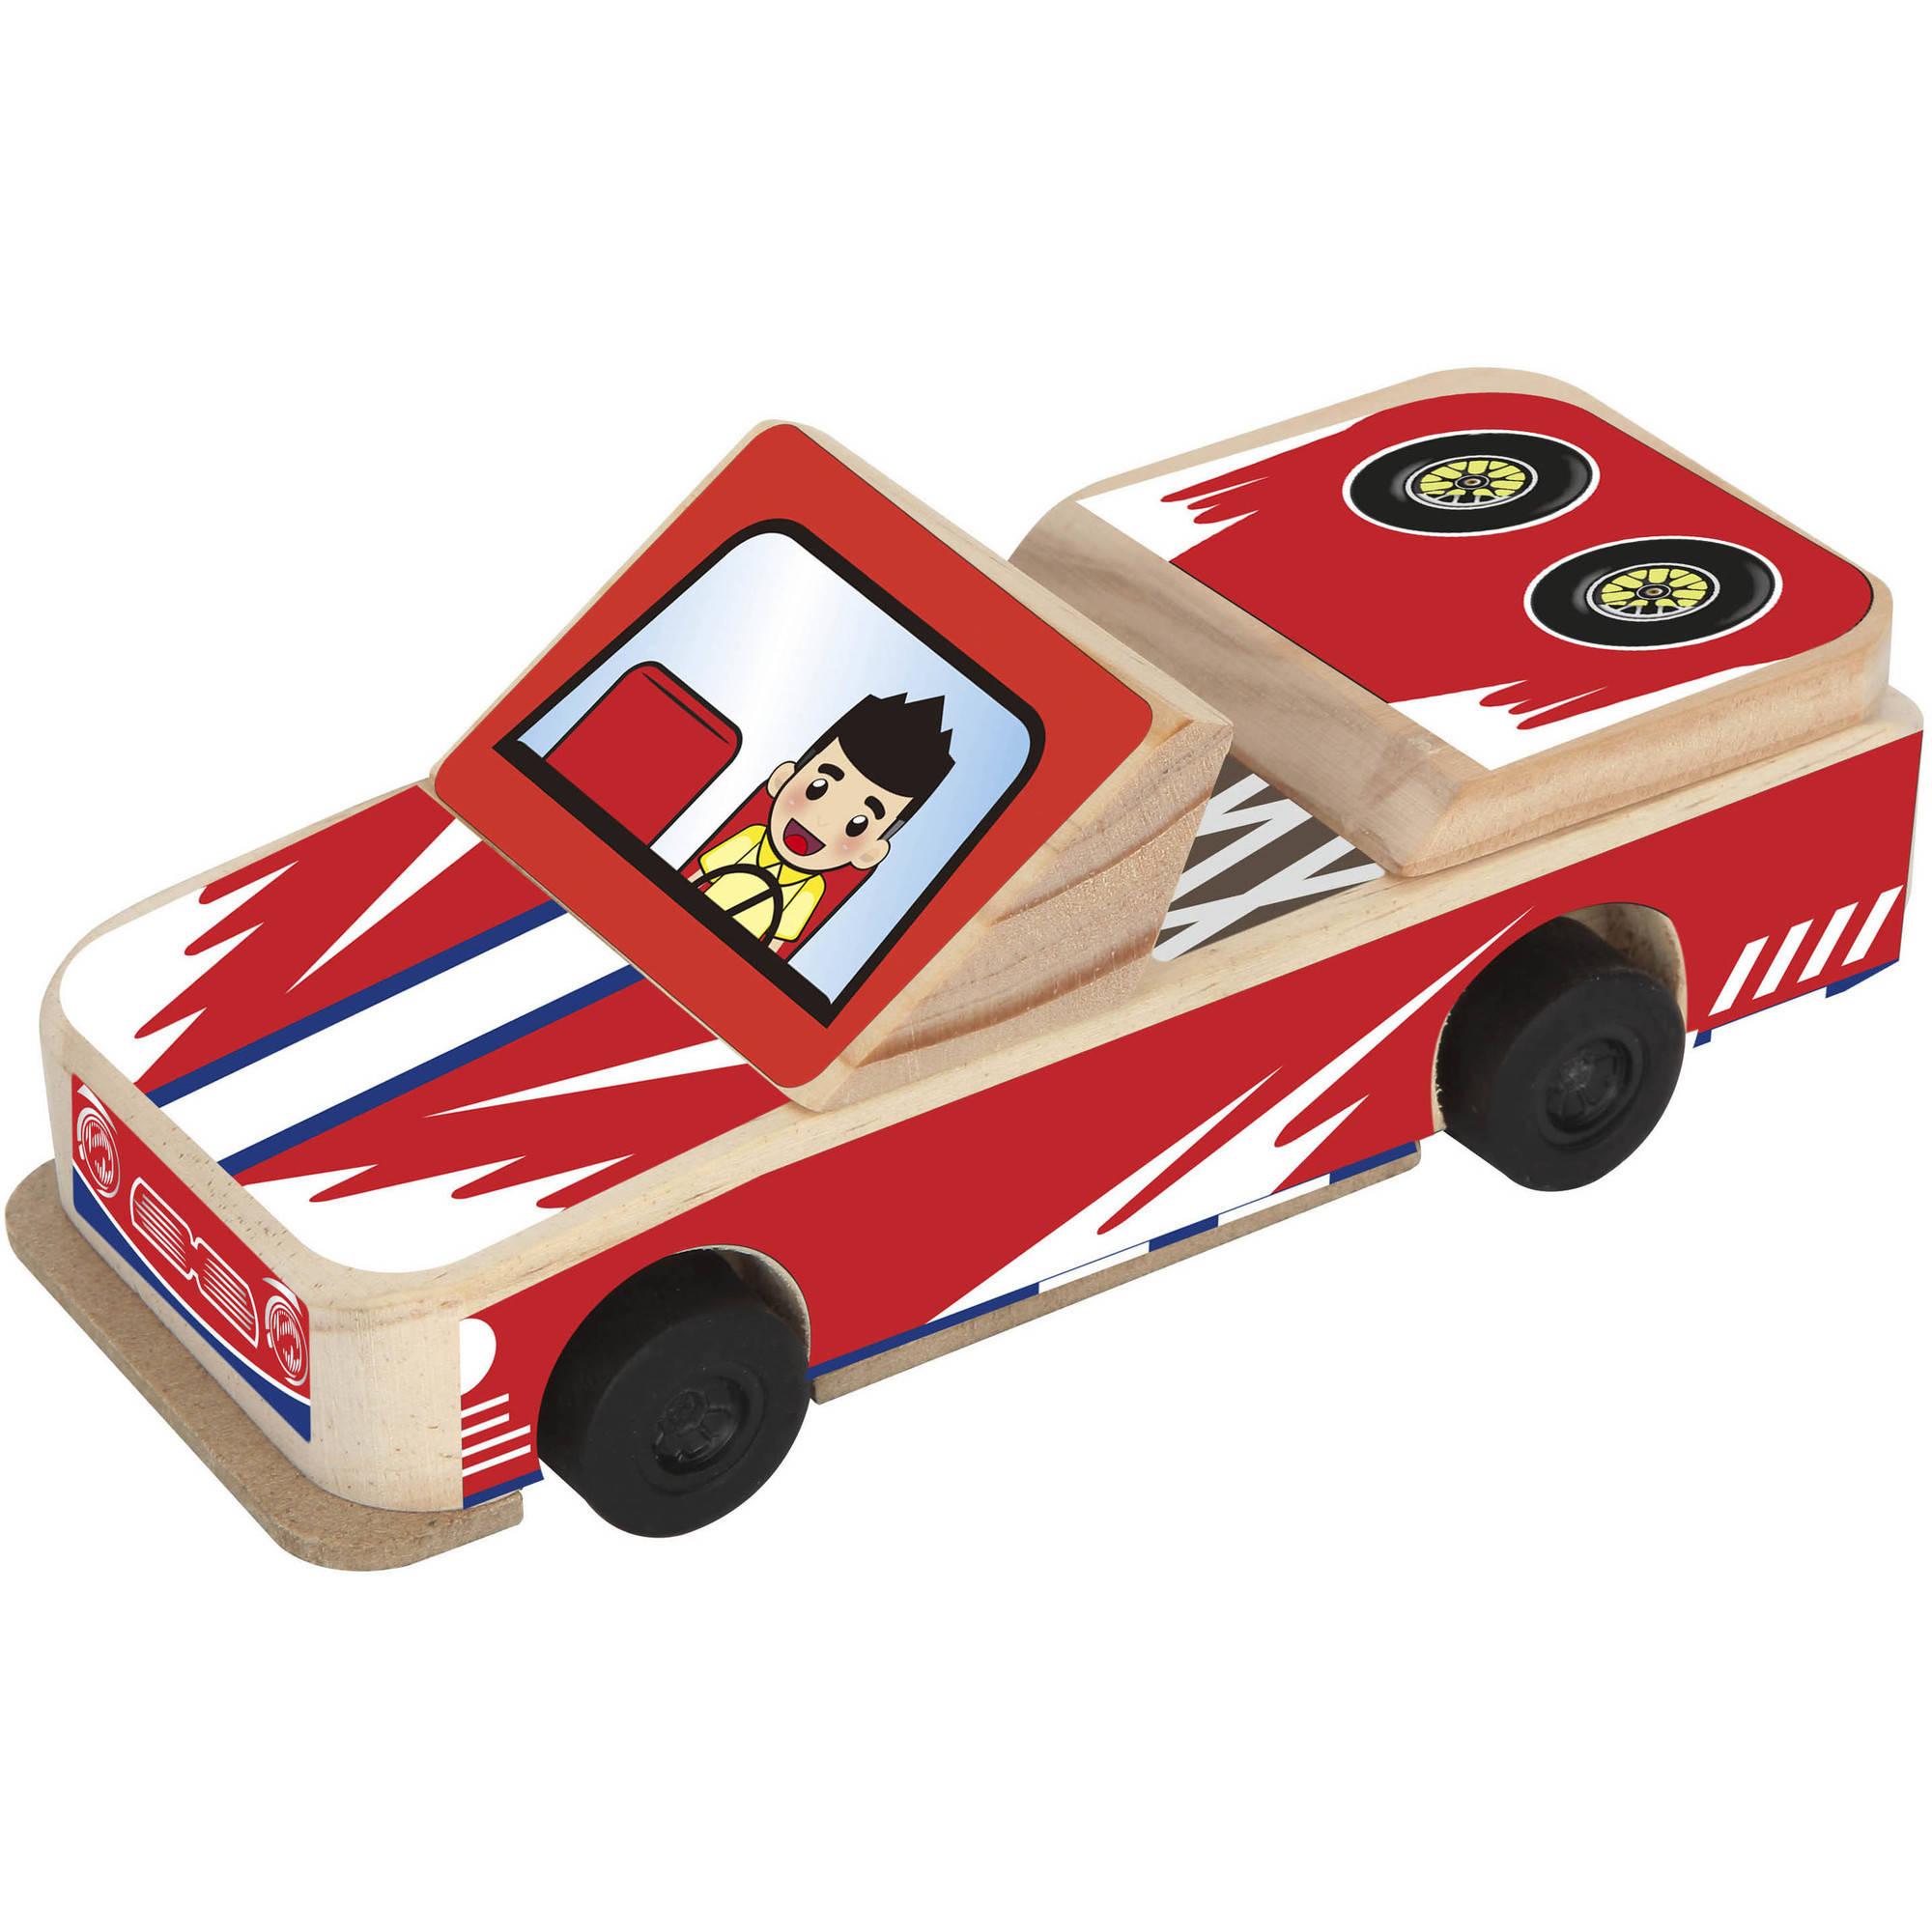 Build a Sport's Car Kid's Project Kit